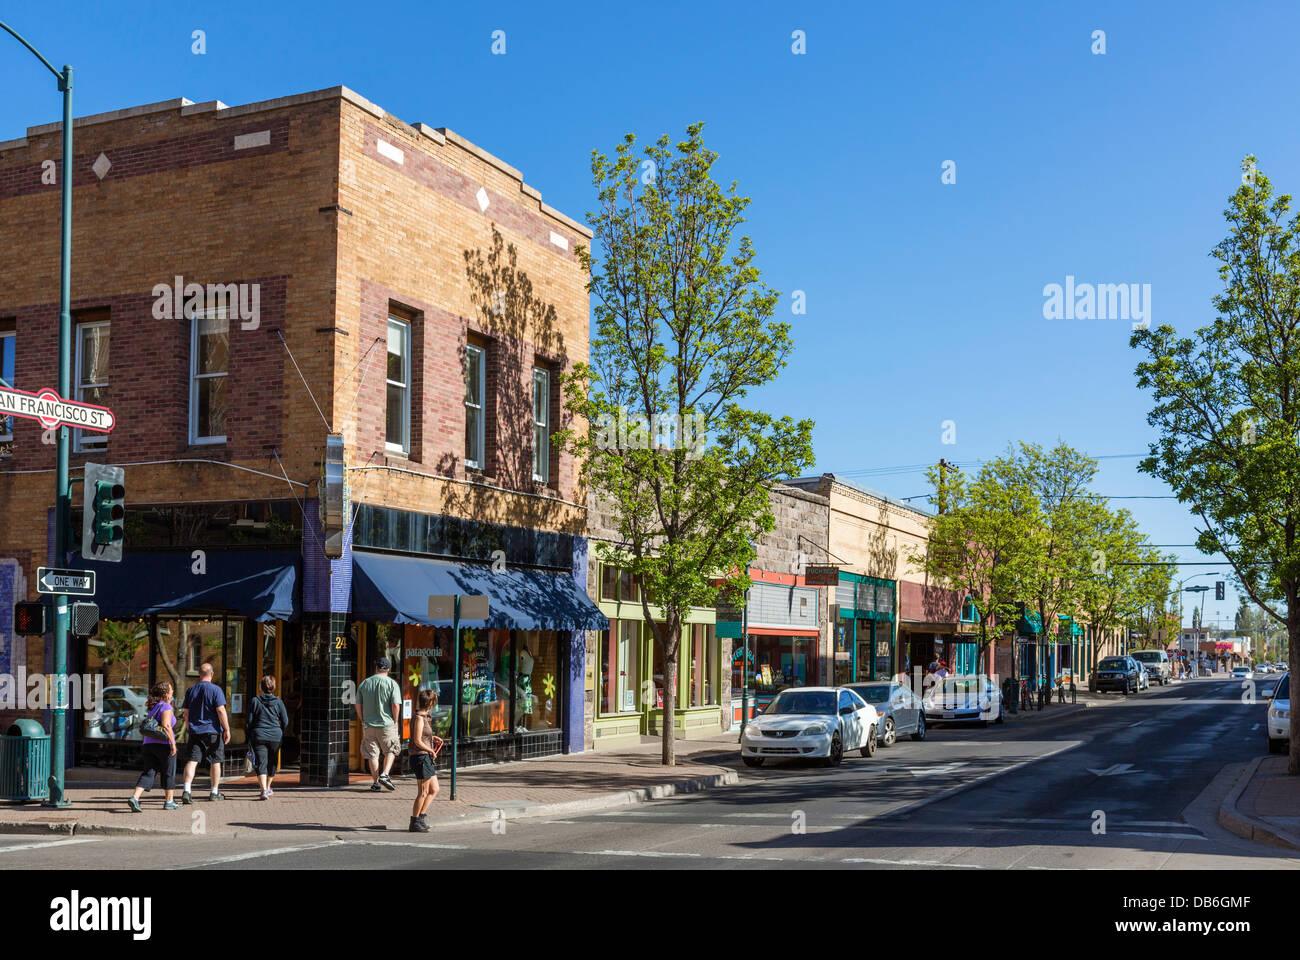 Flagstaff Arizona Downtown Streets Stockfotos & Flagstaff Arizona ...